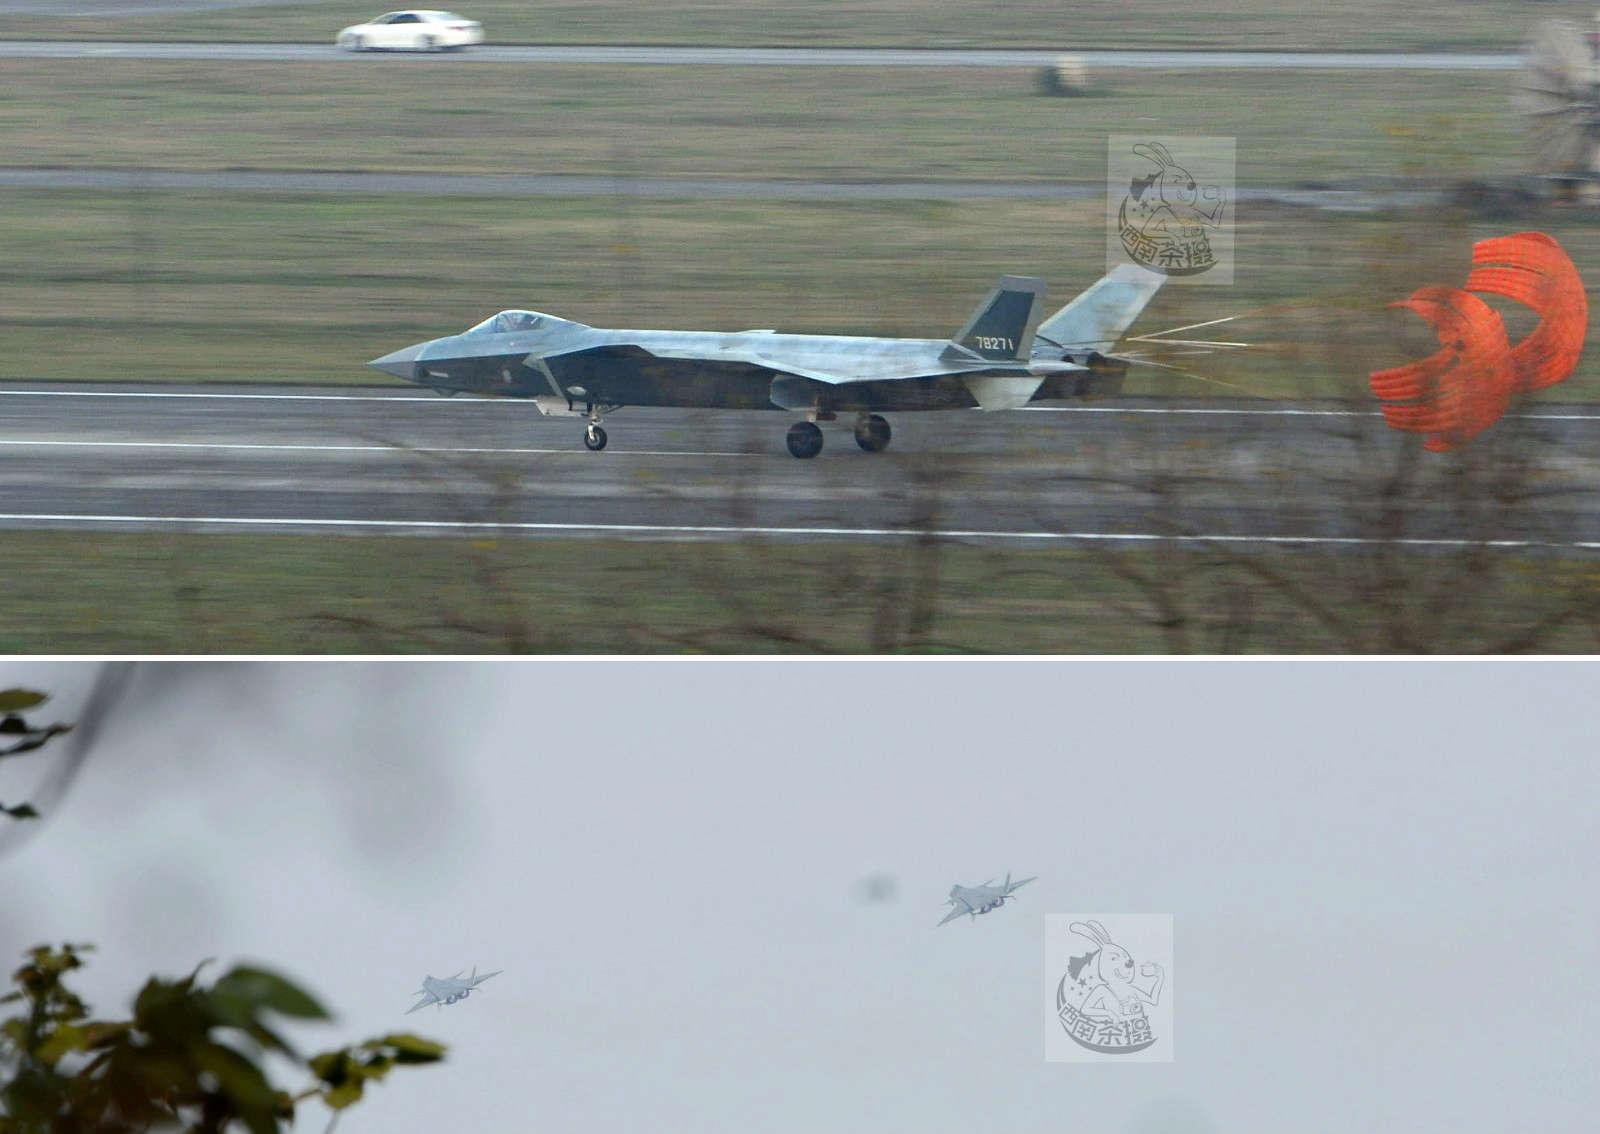 [Aviation] J-10B & J-10C - Page 6 Milit147